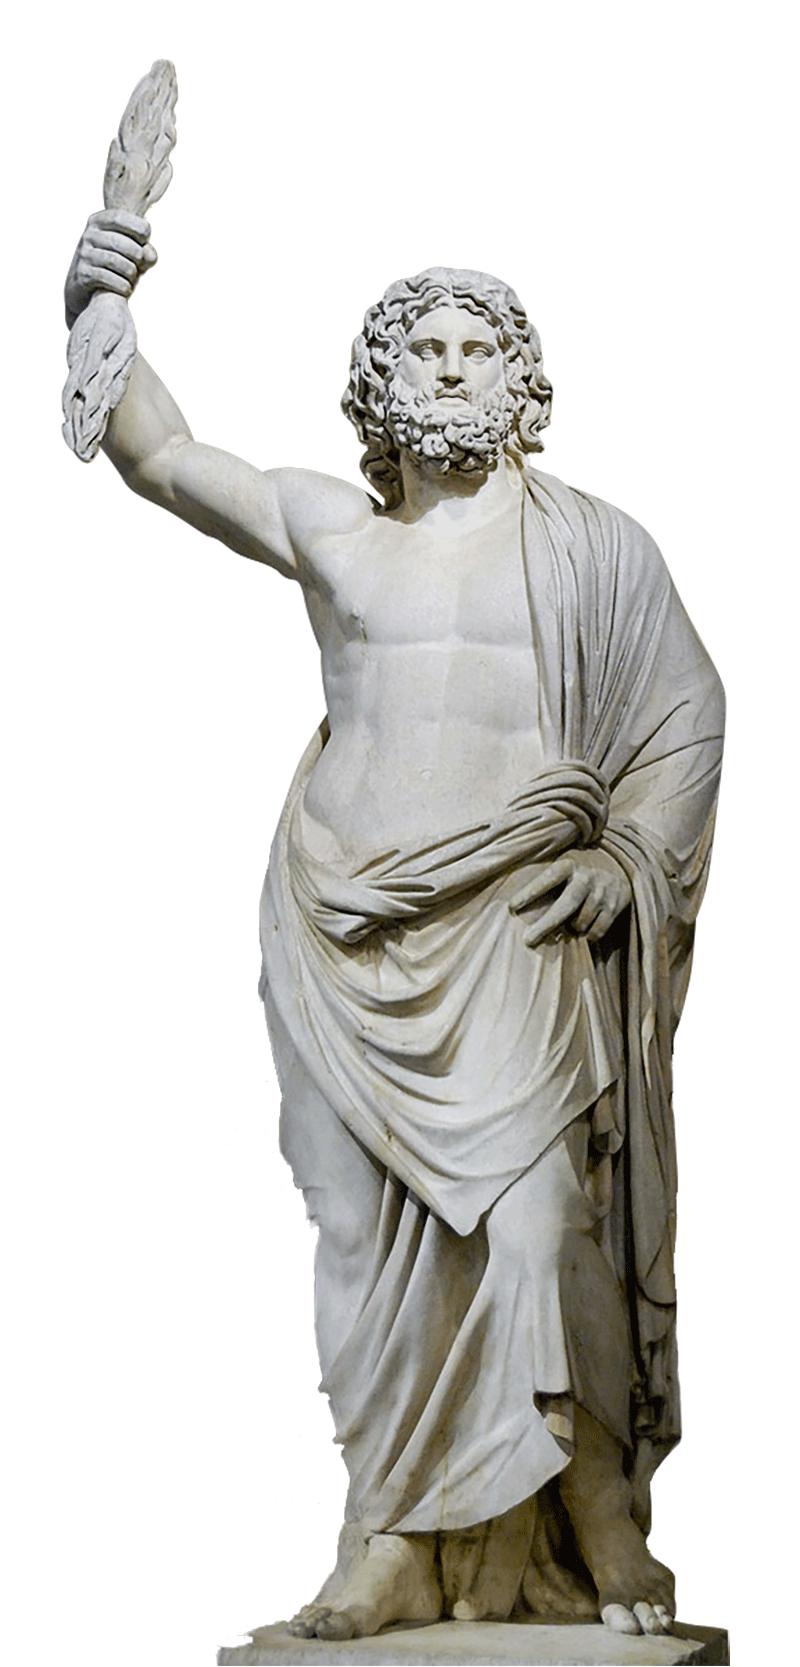 Zeus sous sa forme romaine, Jupiter